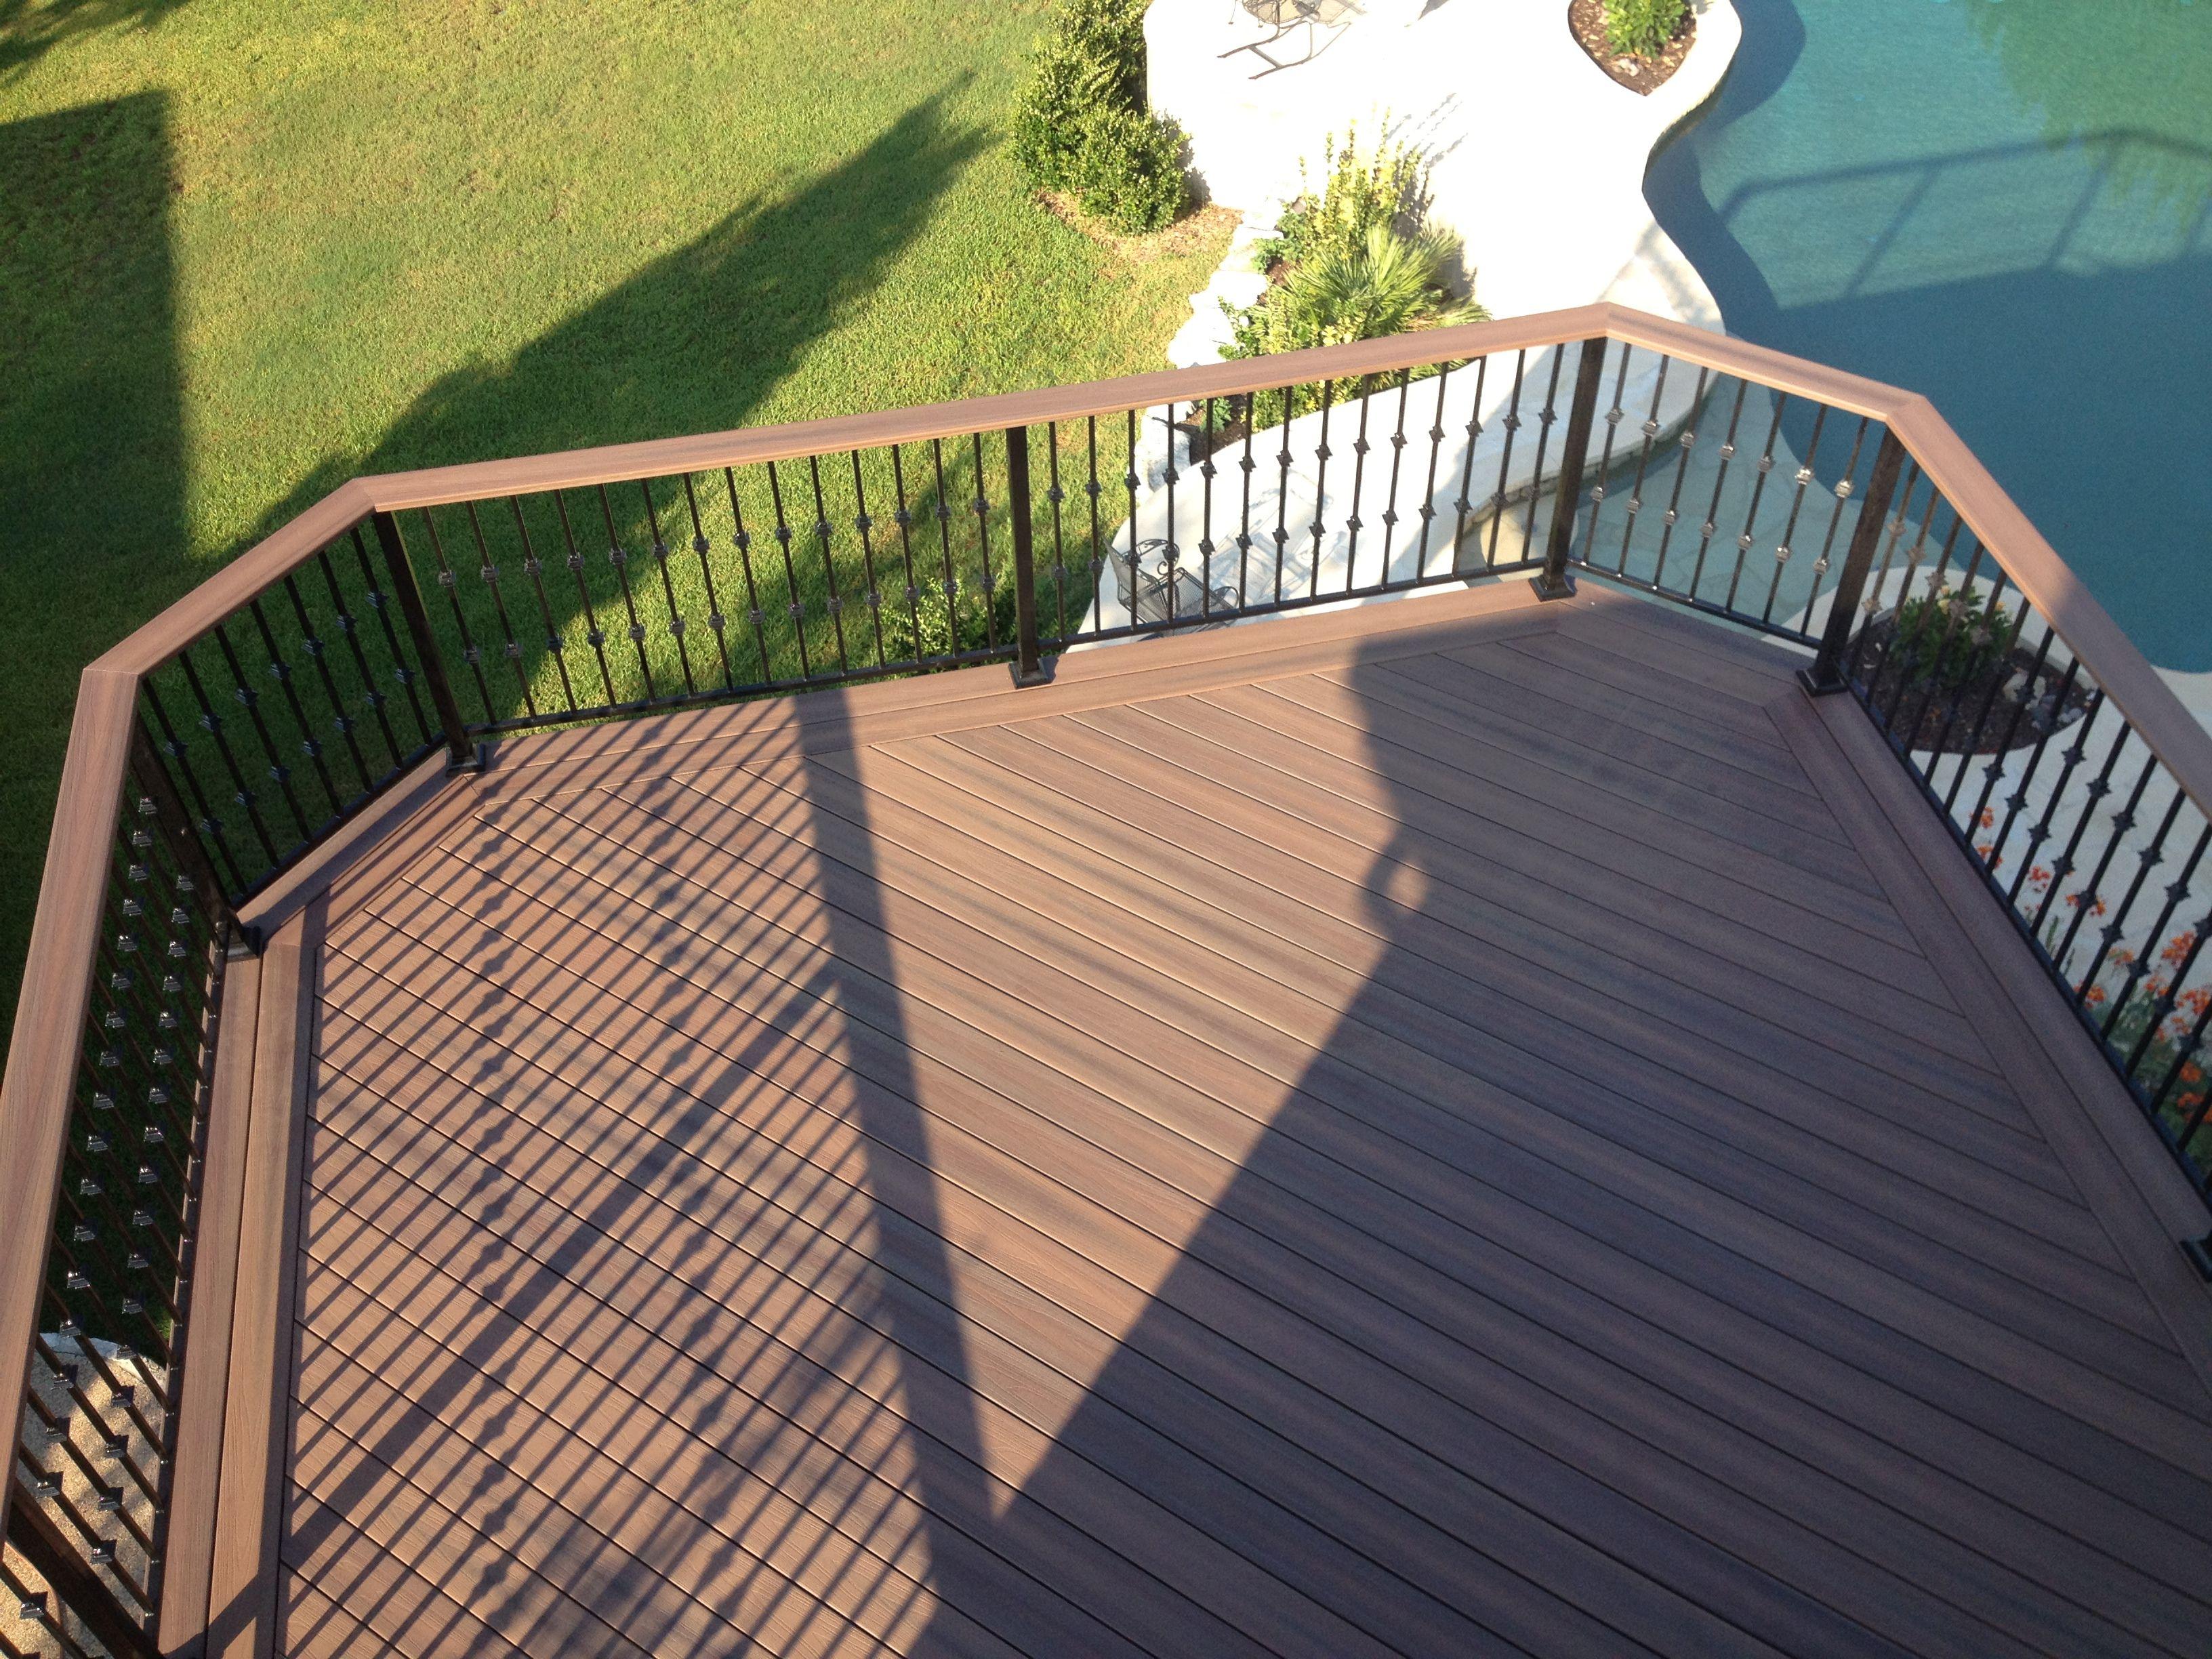 plastic coated handrails